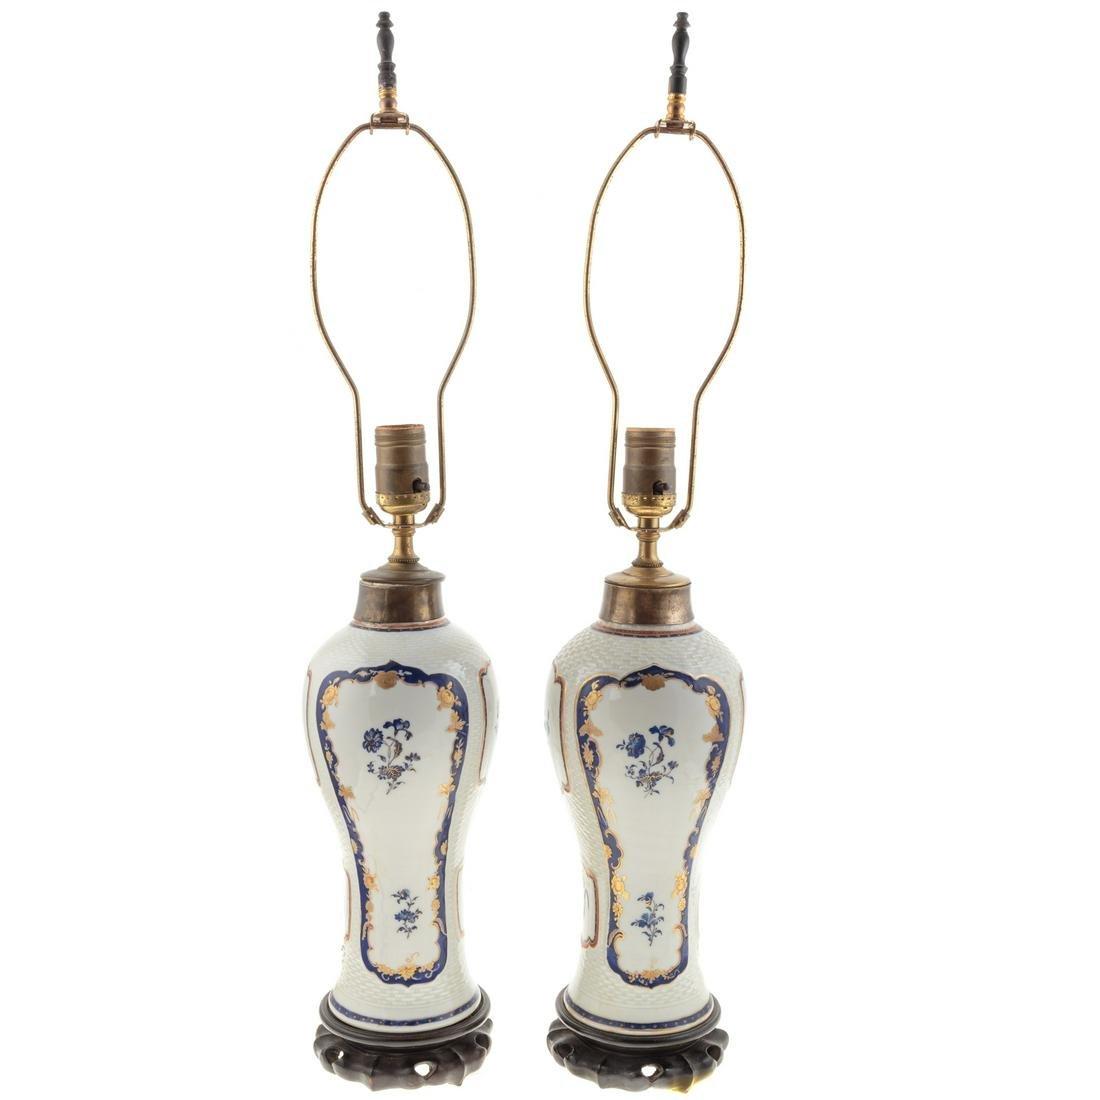 Pair Chinese Export Garniture Lamps